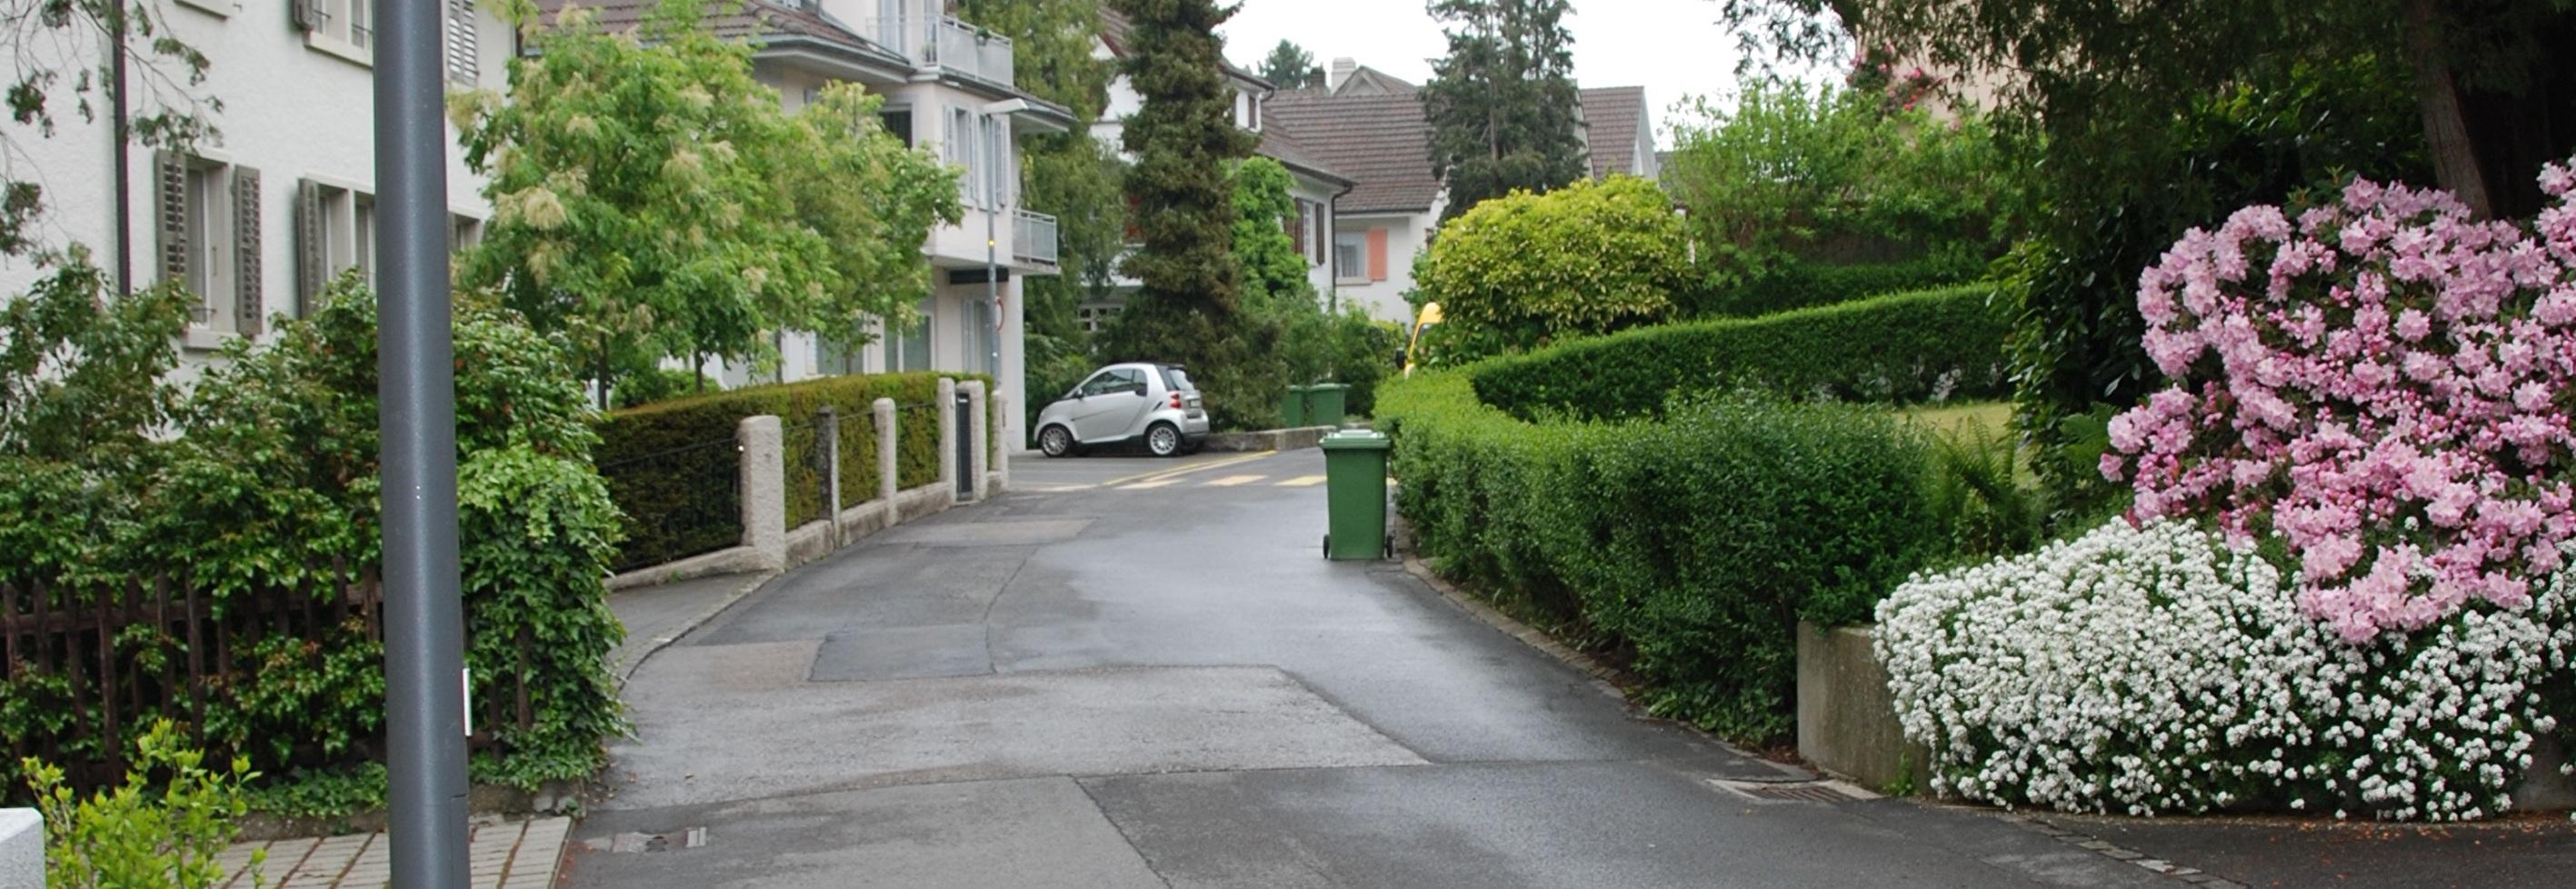 Bild Ruflisbergstrasse